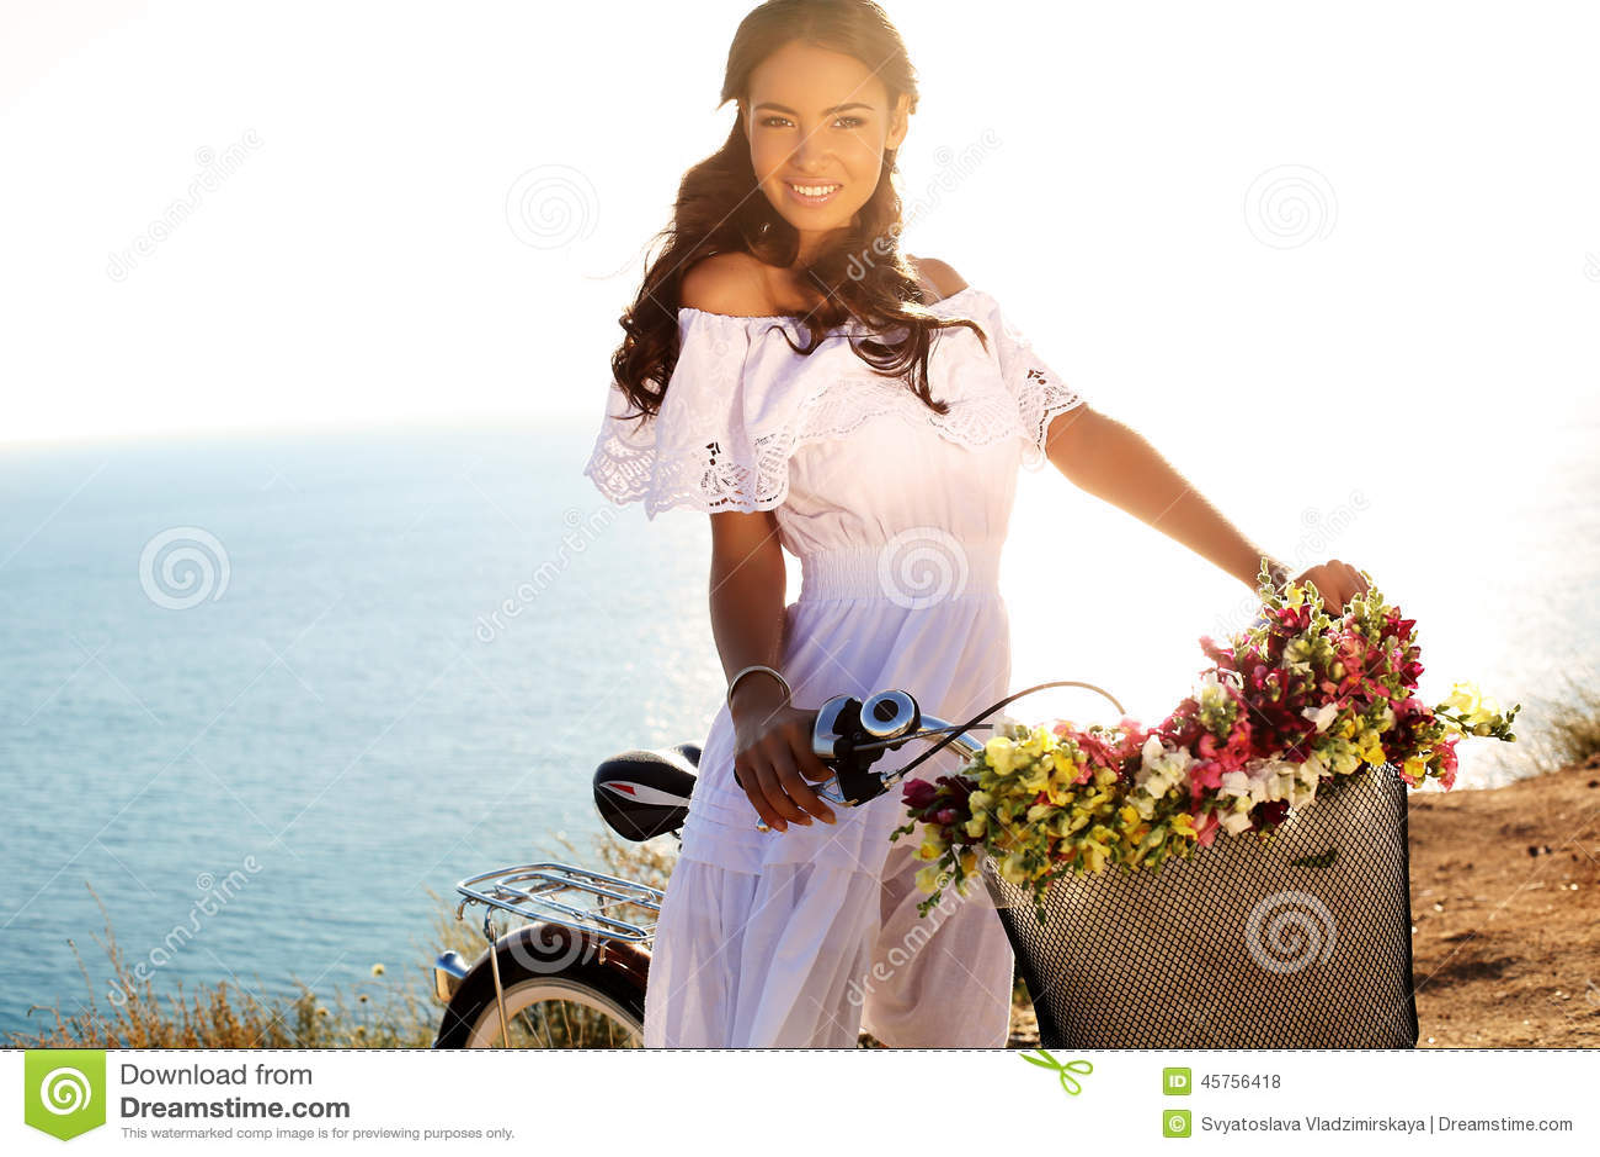 Pretty Smiling Girl With Dark Hair In Elegant Dress